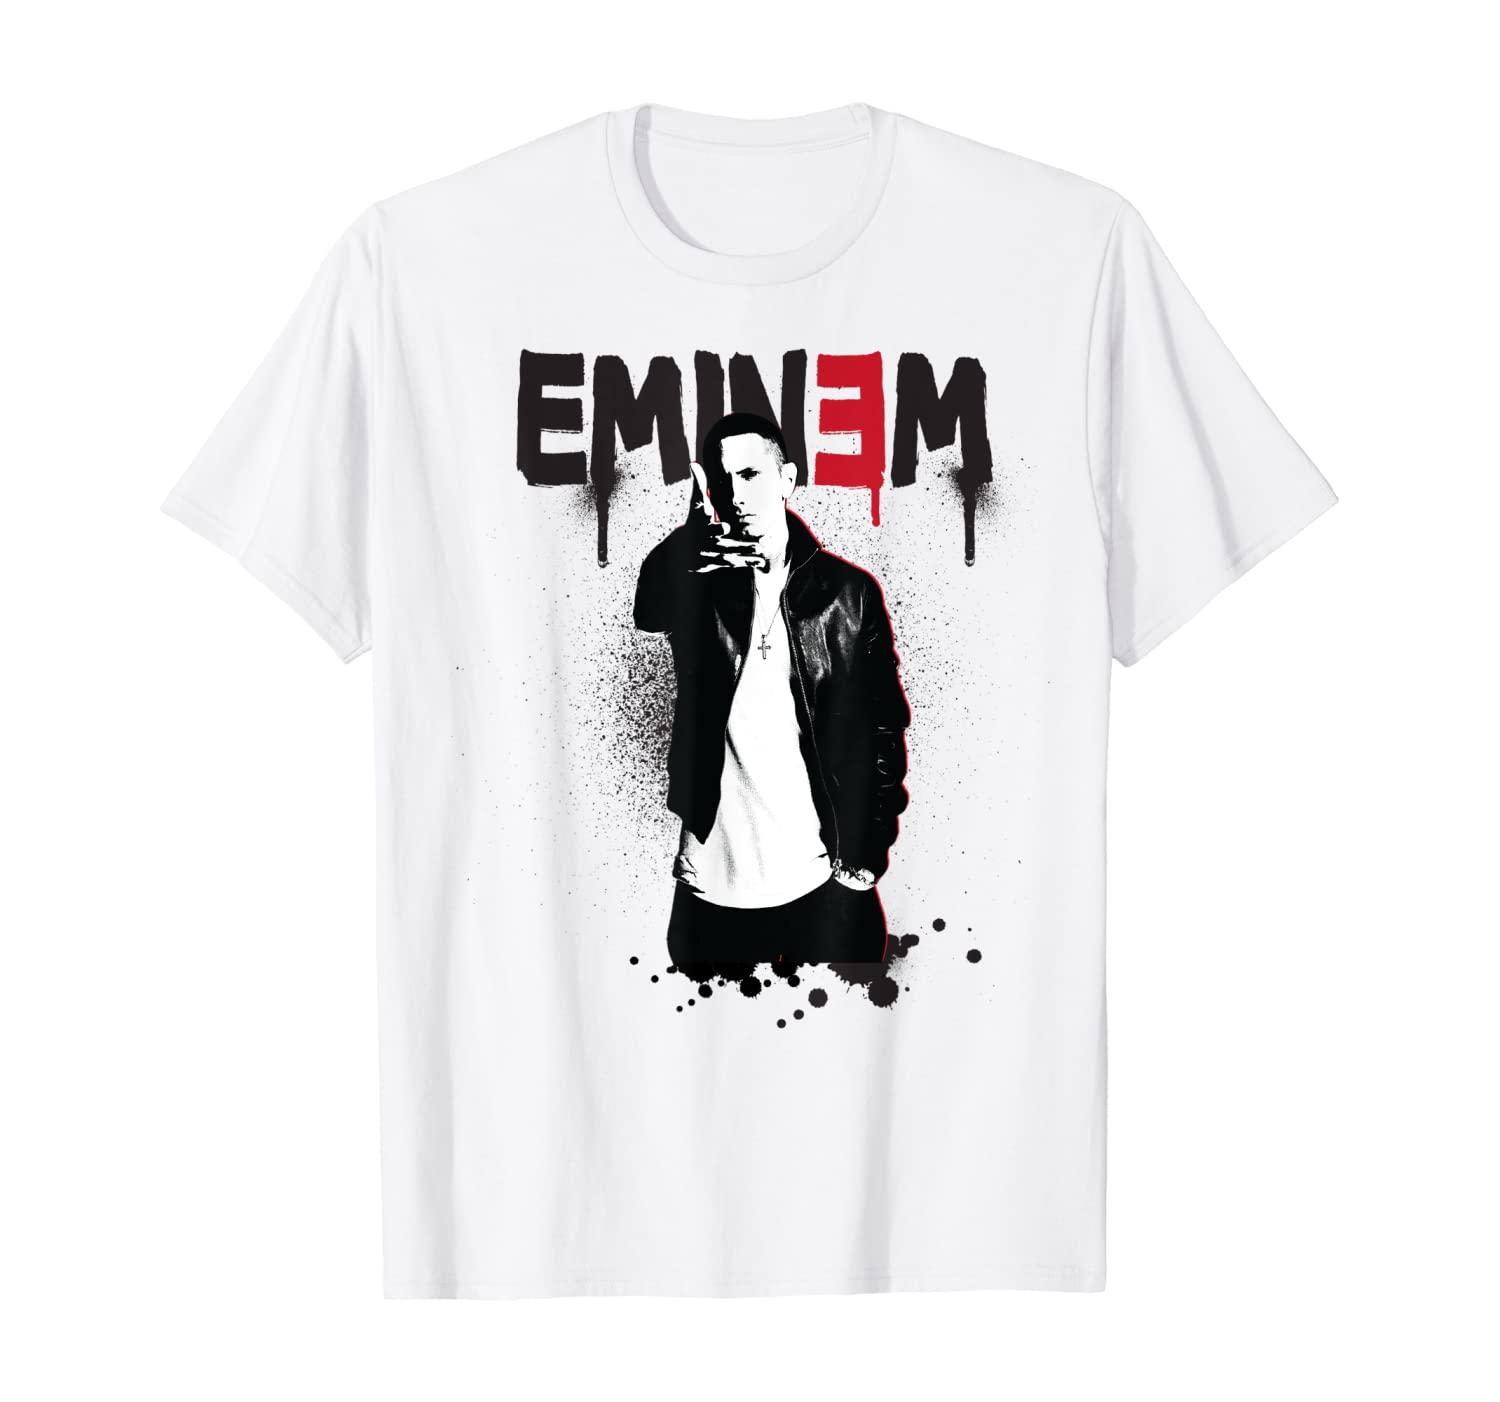 Eminem Official Sprayed Up T-Shirt